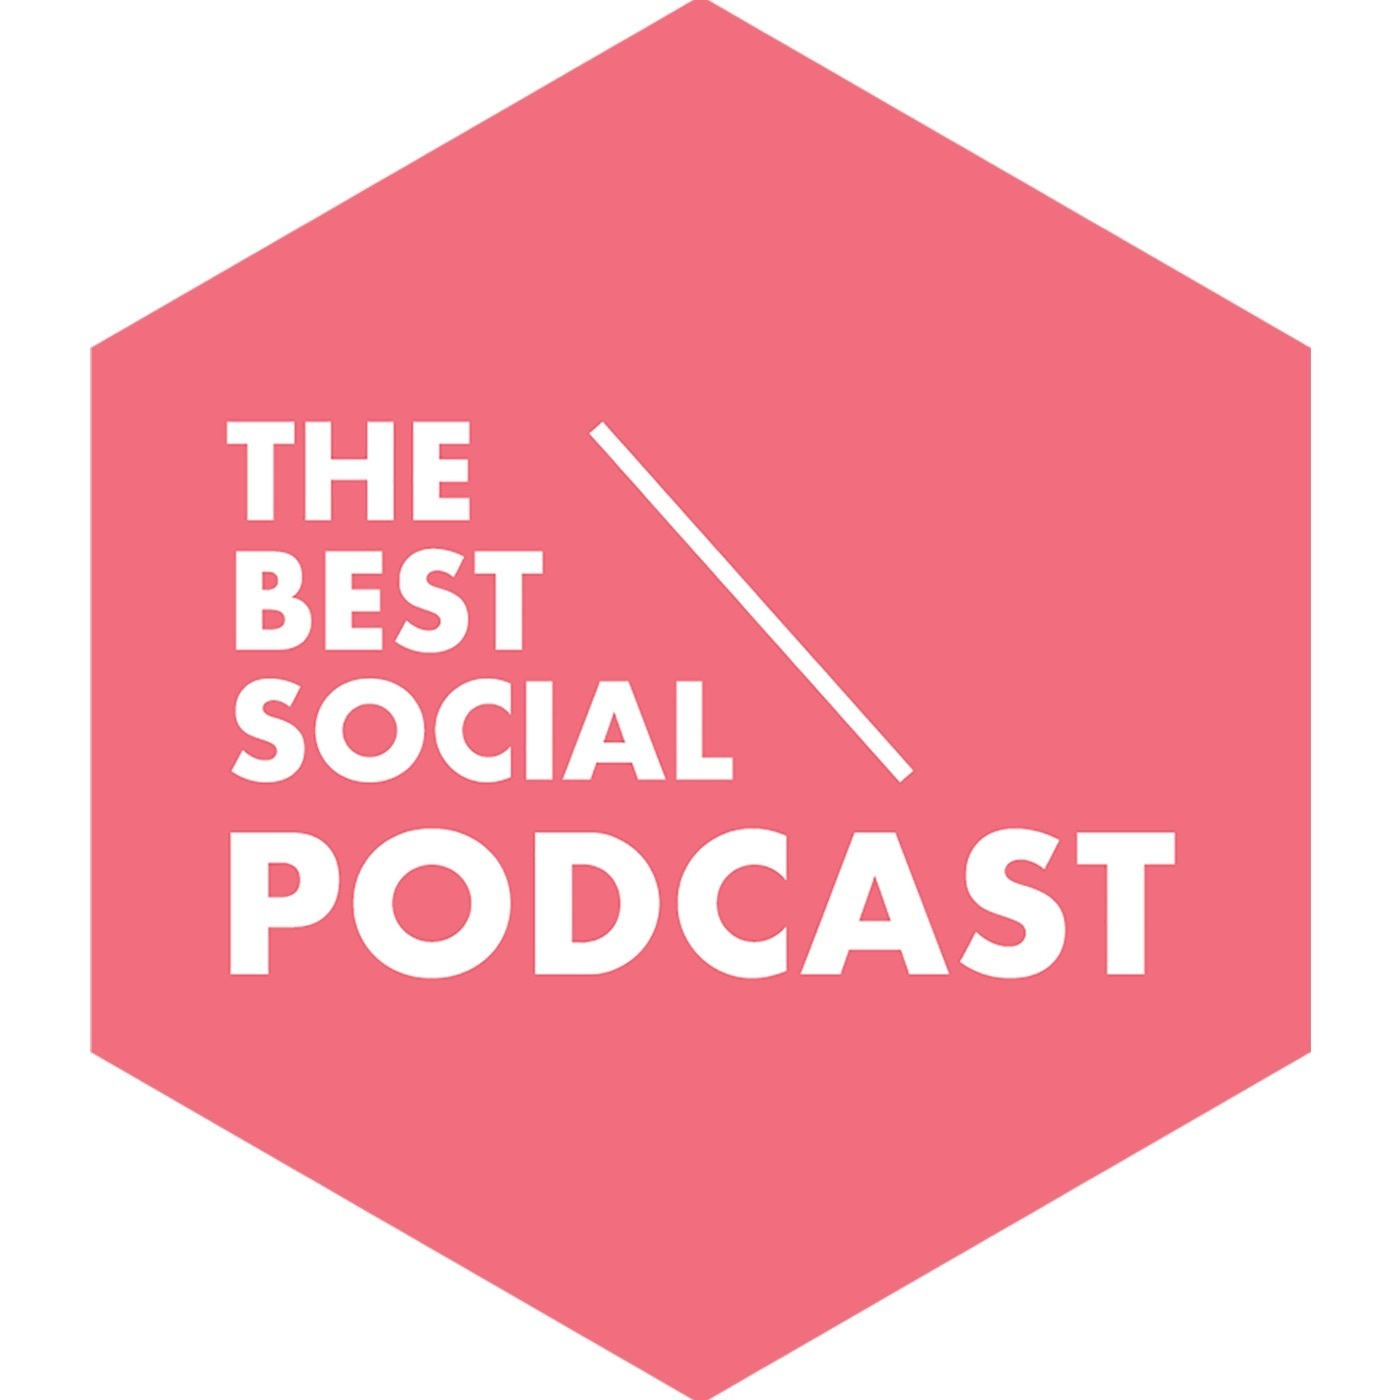 The Best Social Podcast logo